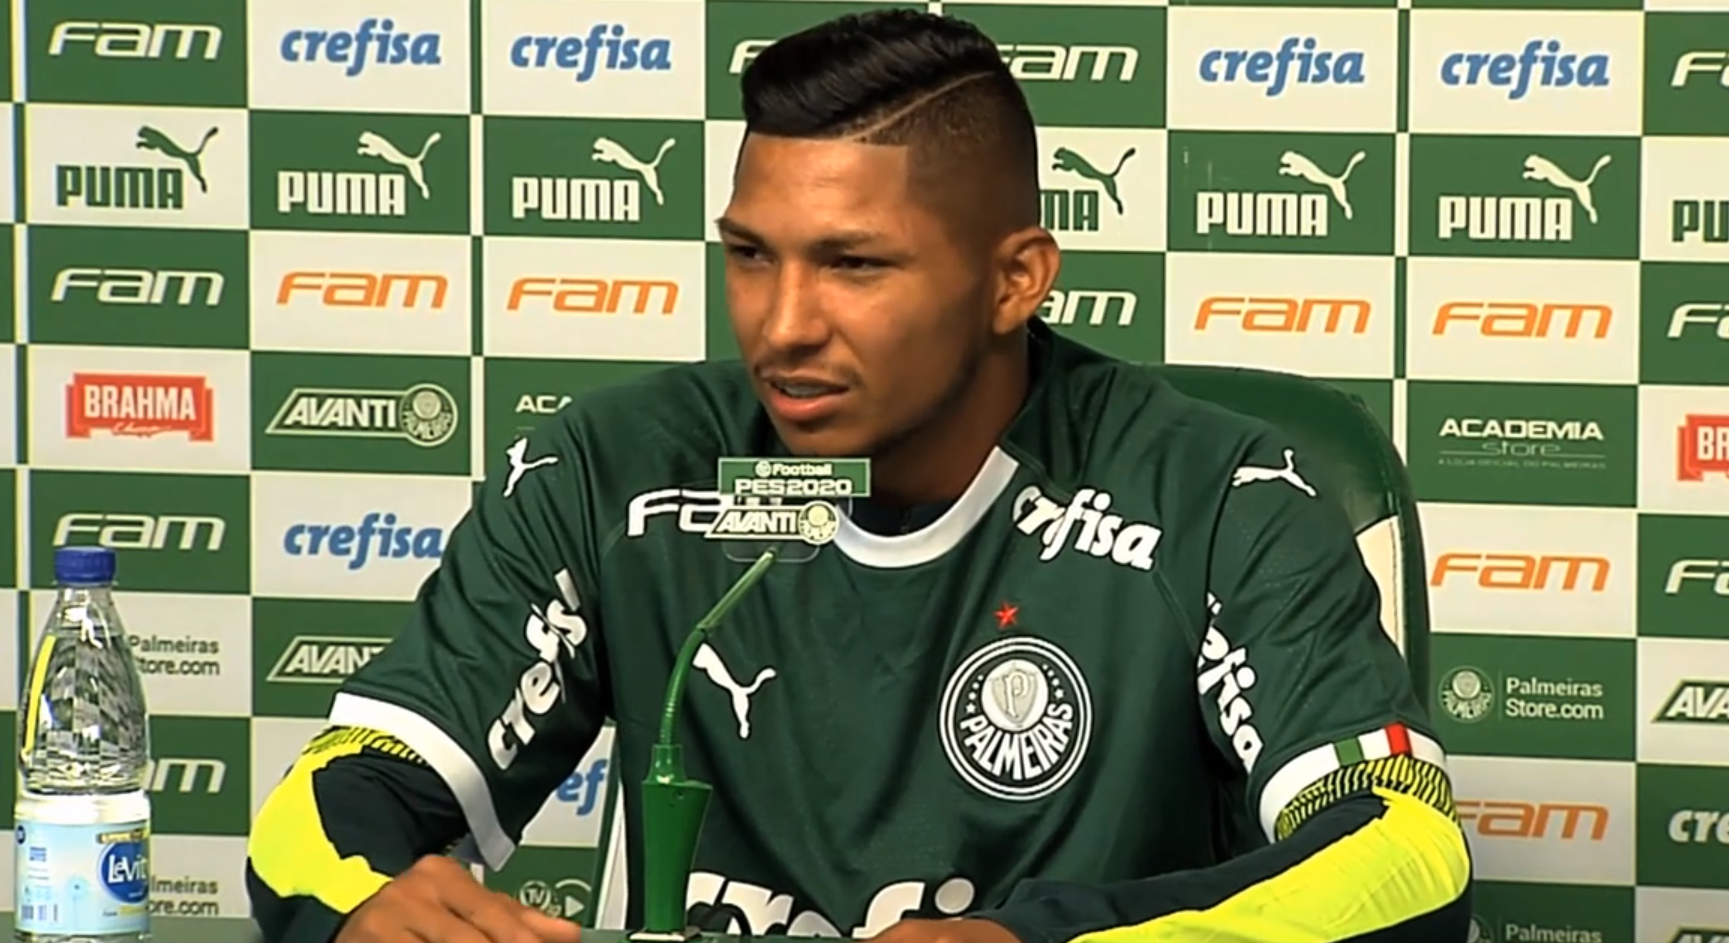 Rony fala do interesse do Corinthians